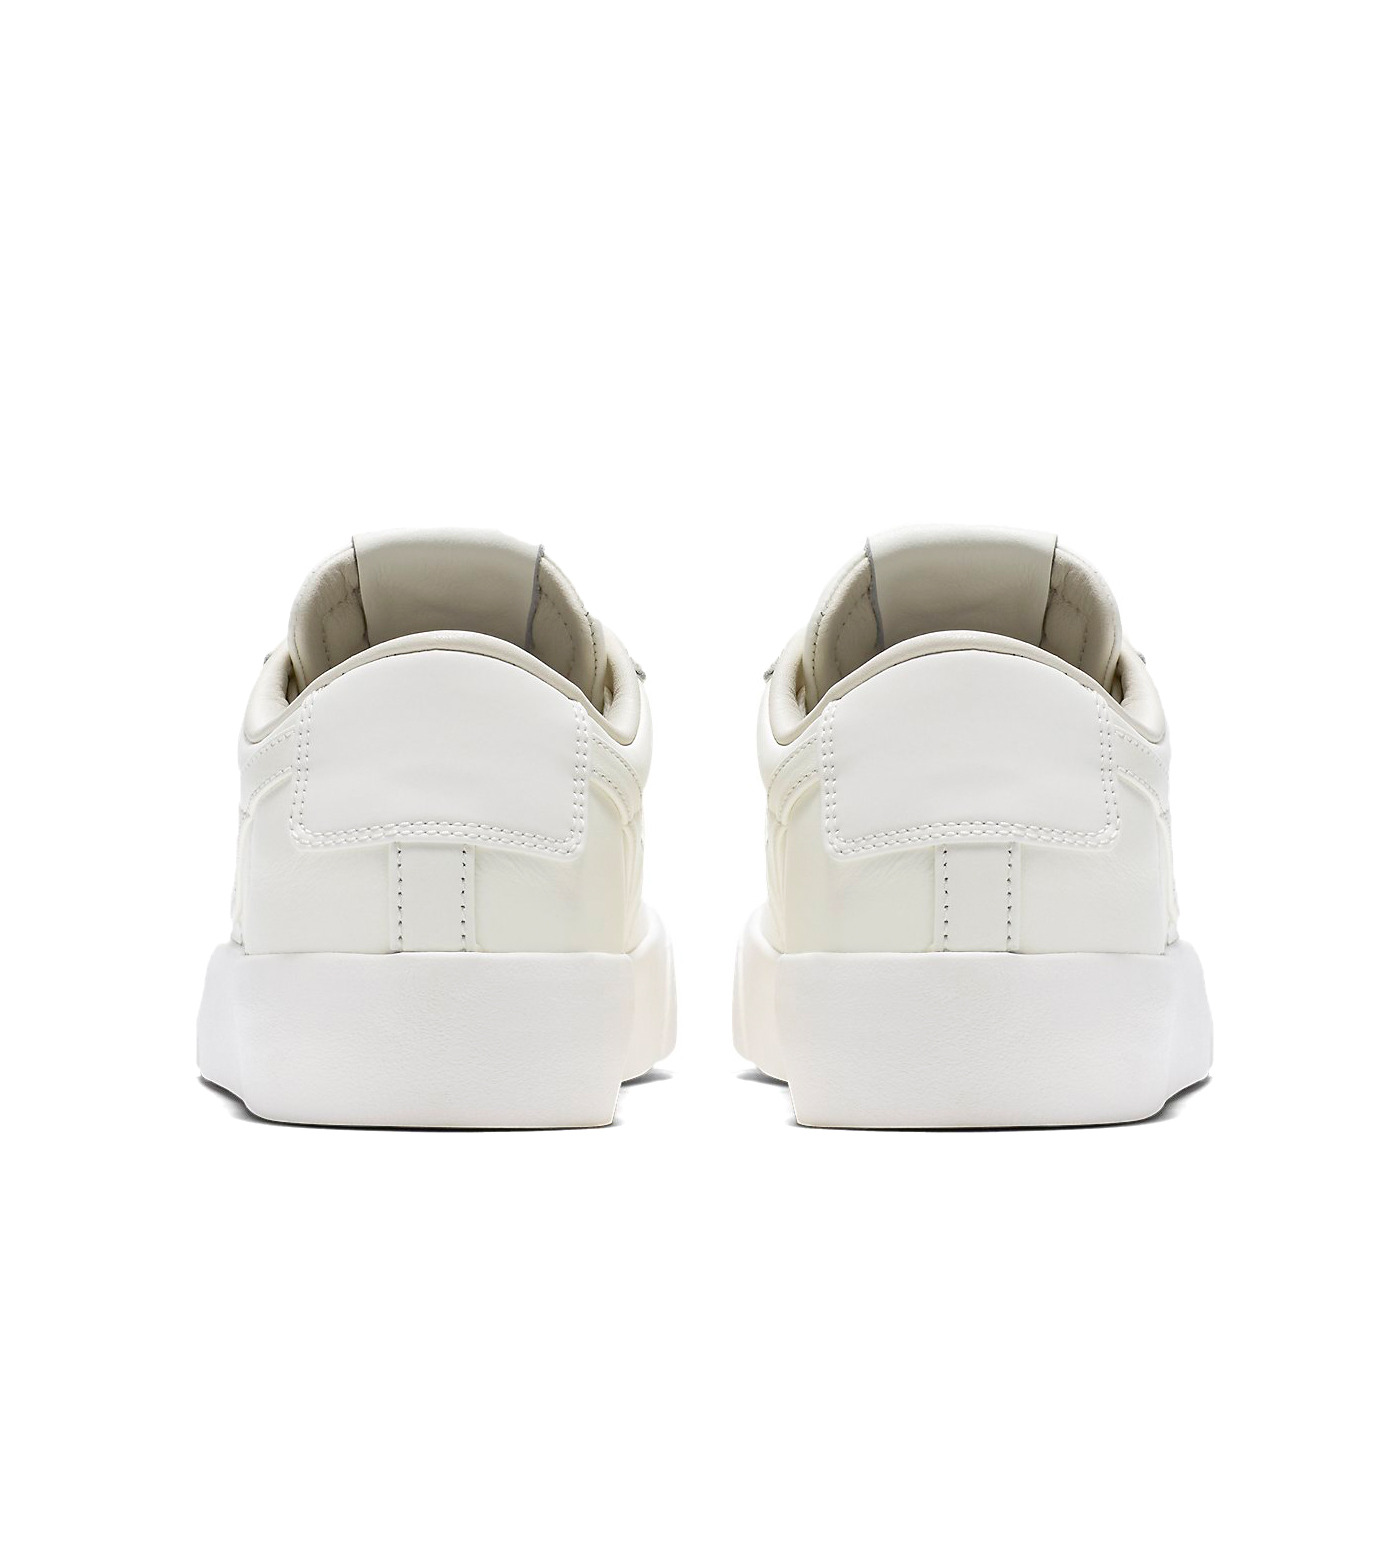 NIKE(ナイキ)のBLAZER STUDIO LOW-WHITE(シューズ/shoes)-904804-100-4 拡大詳細画像6